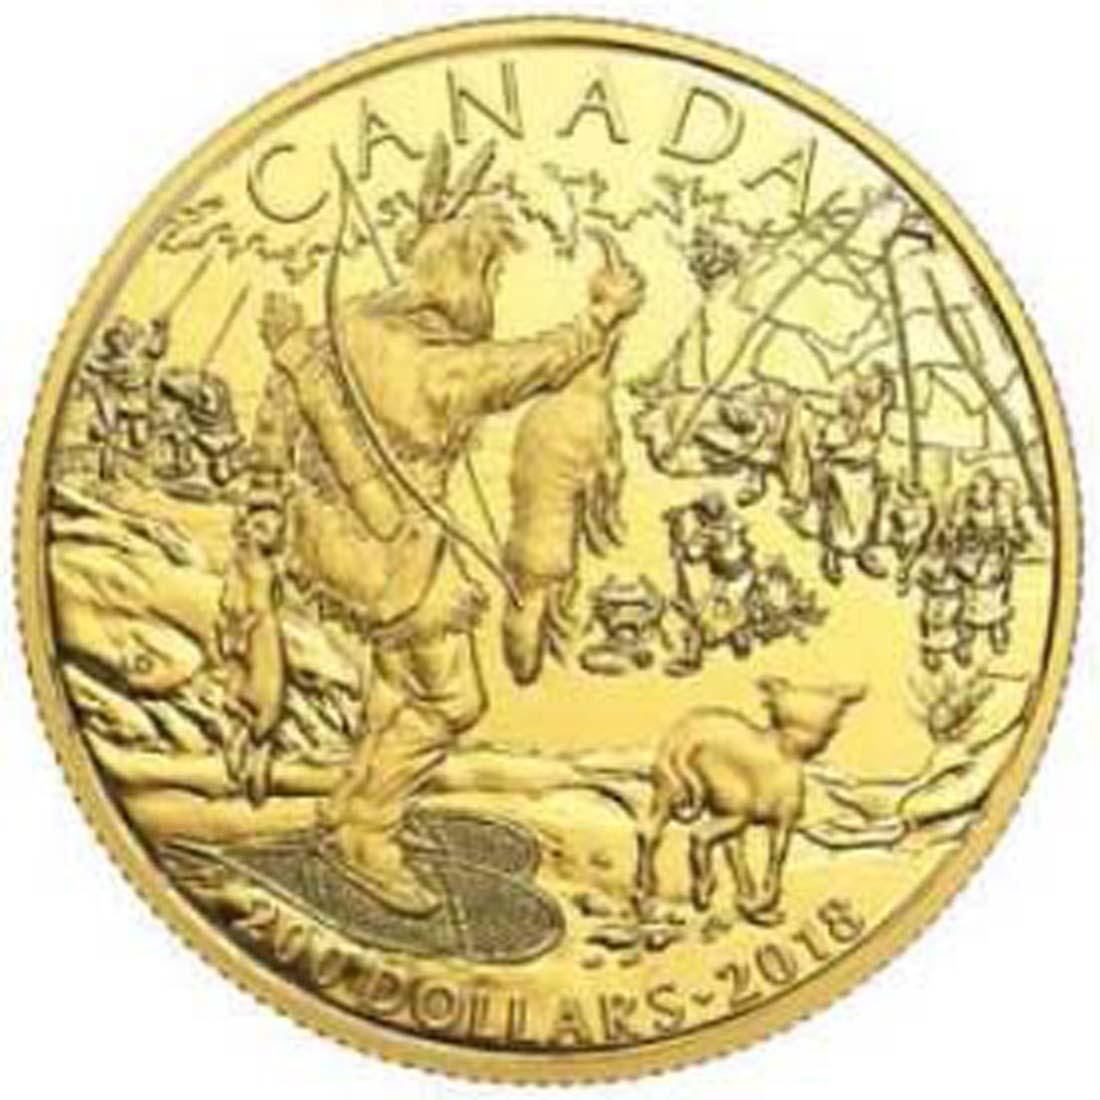 Kanada : 200 Dollar Kanadische Geschichte - First Nations  2018 PP